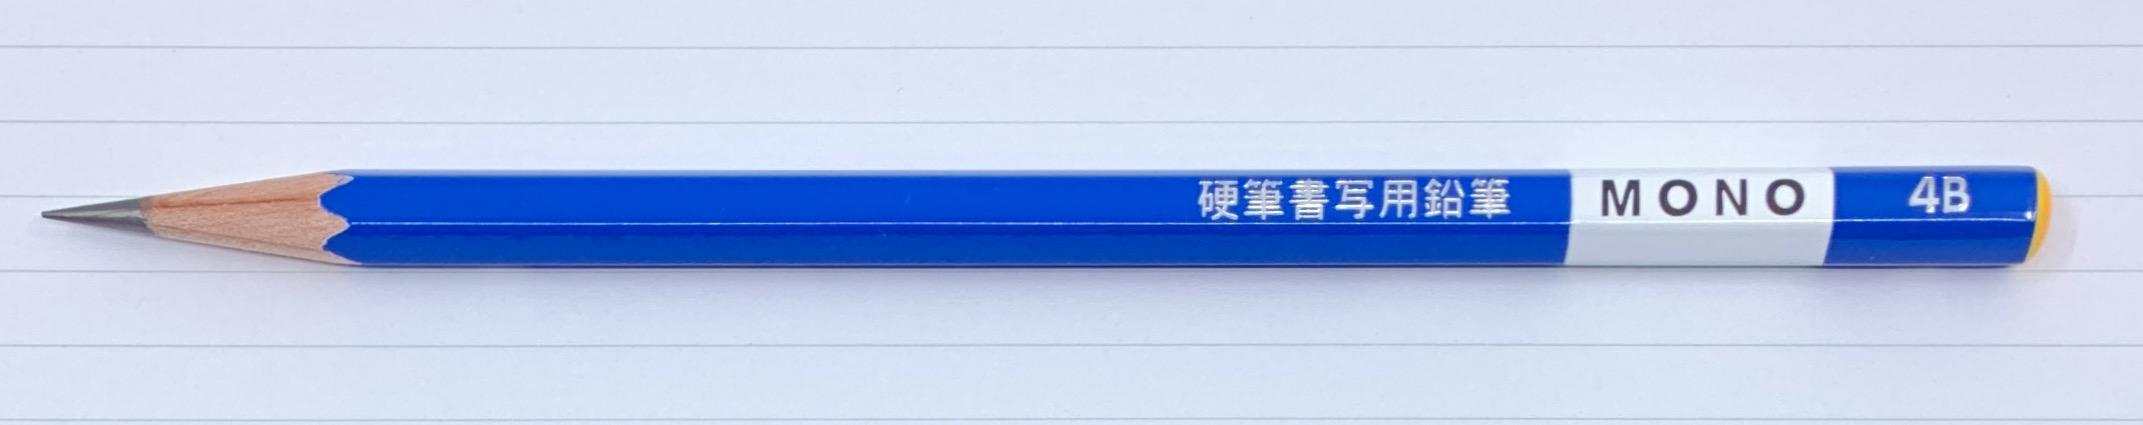 Tombow Mono KM-KKS 4B Pencil Review